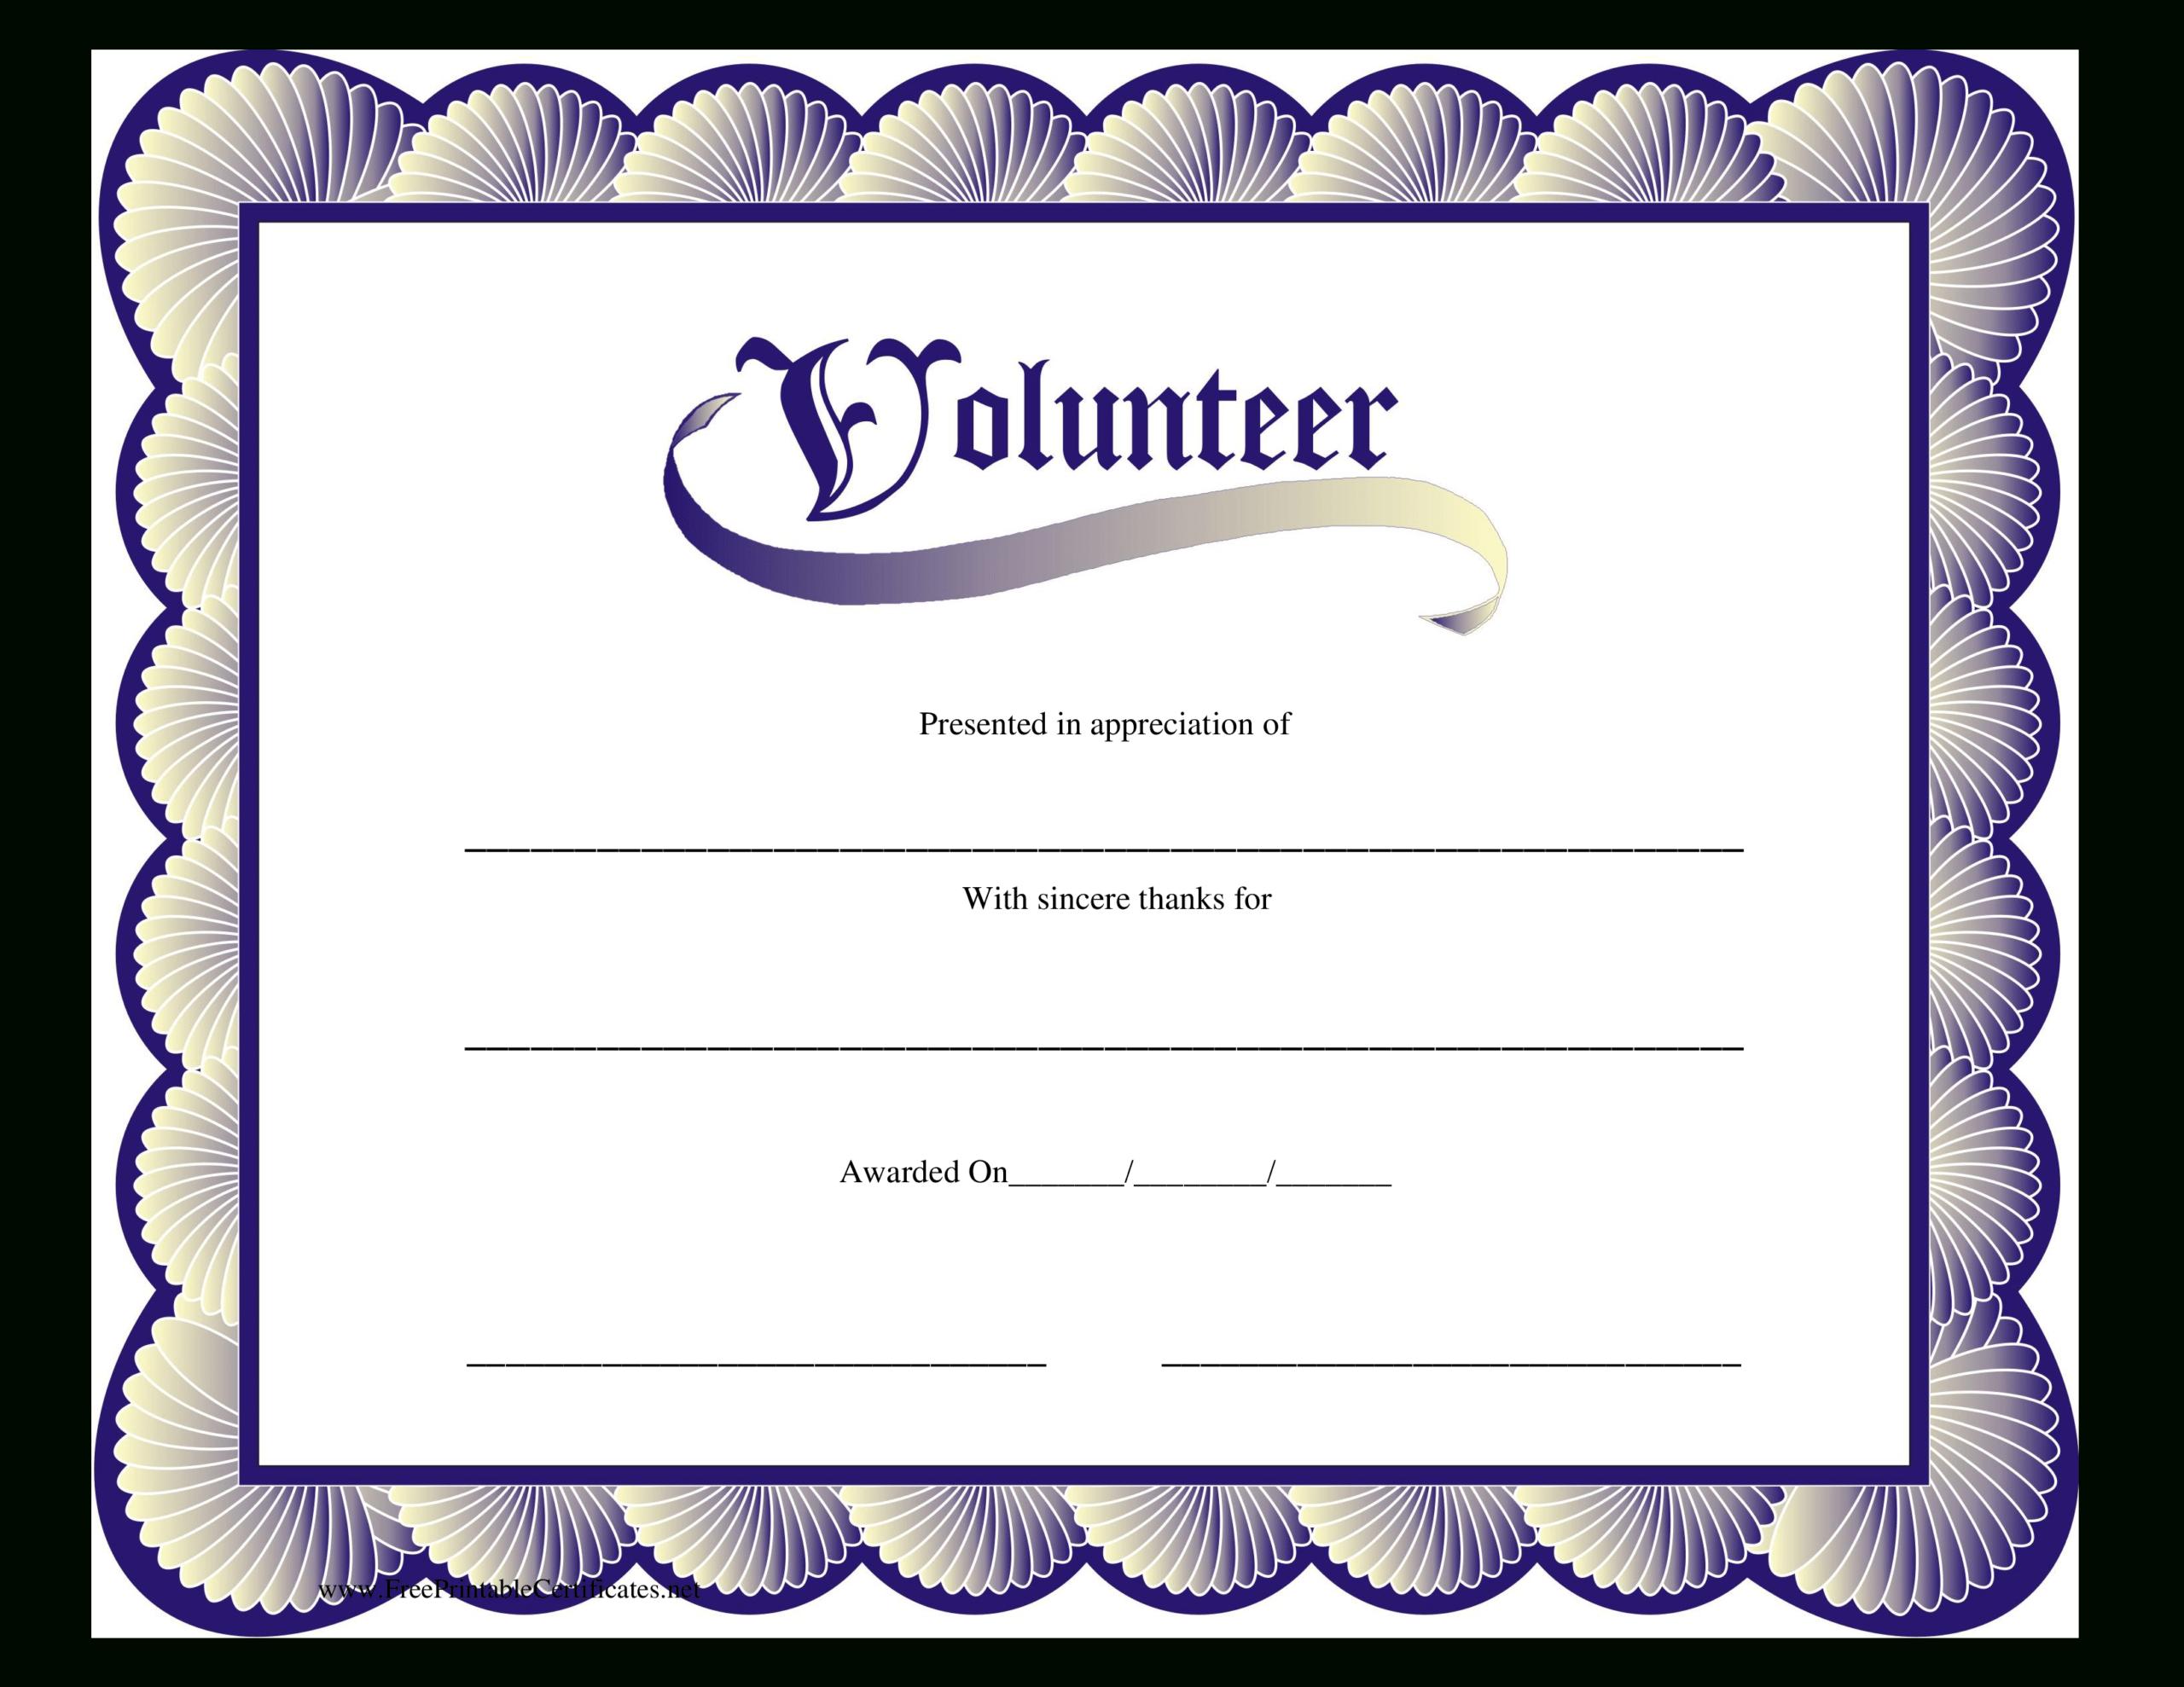 Volunteer Certificate | Templates At Allbusinesstemplates Intended For Volunteer Certificate Templates